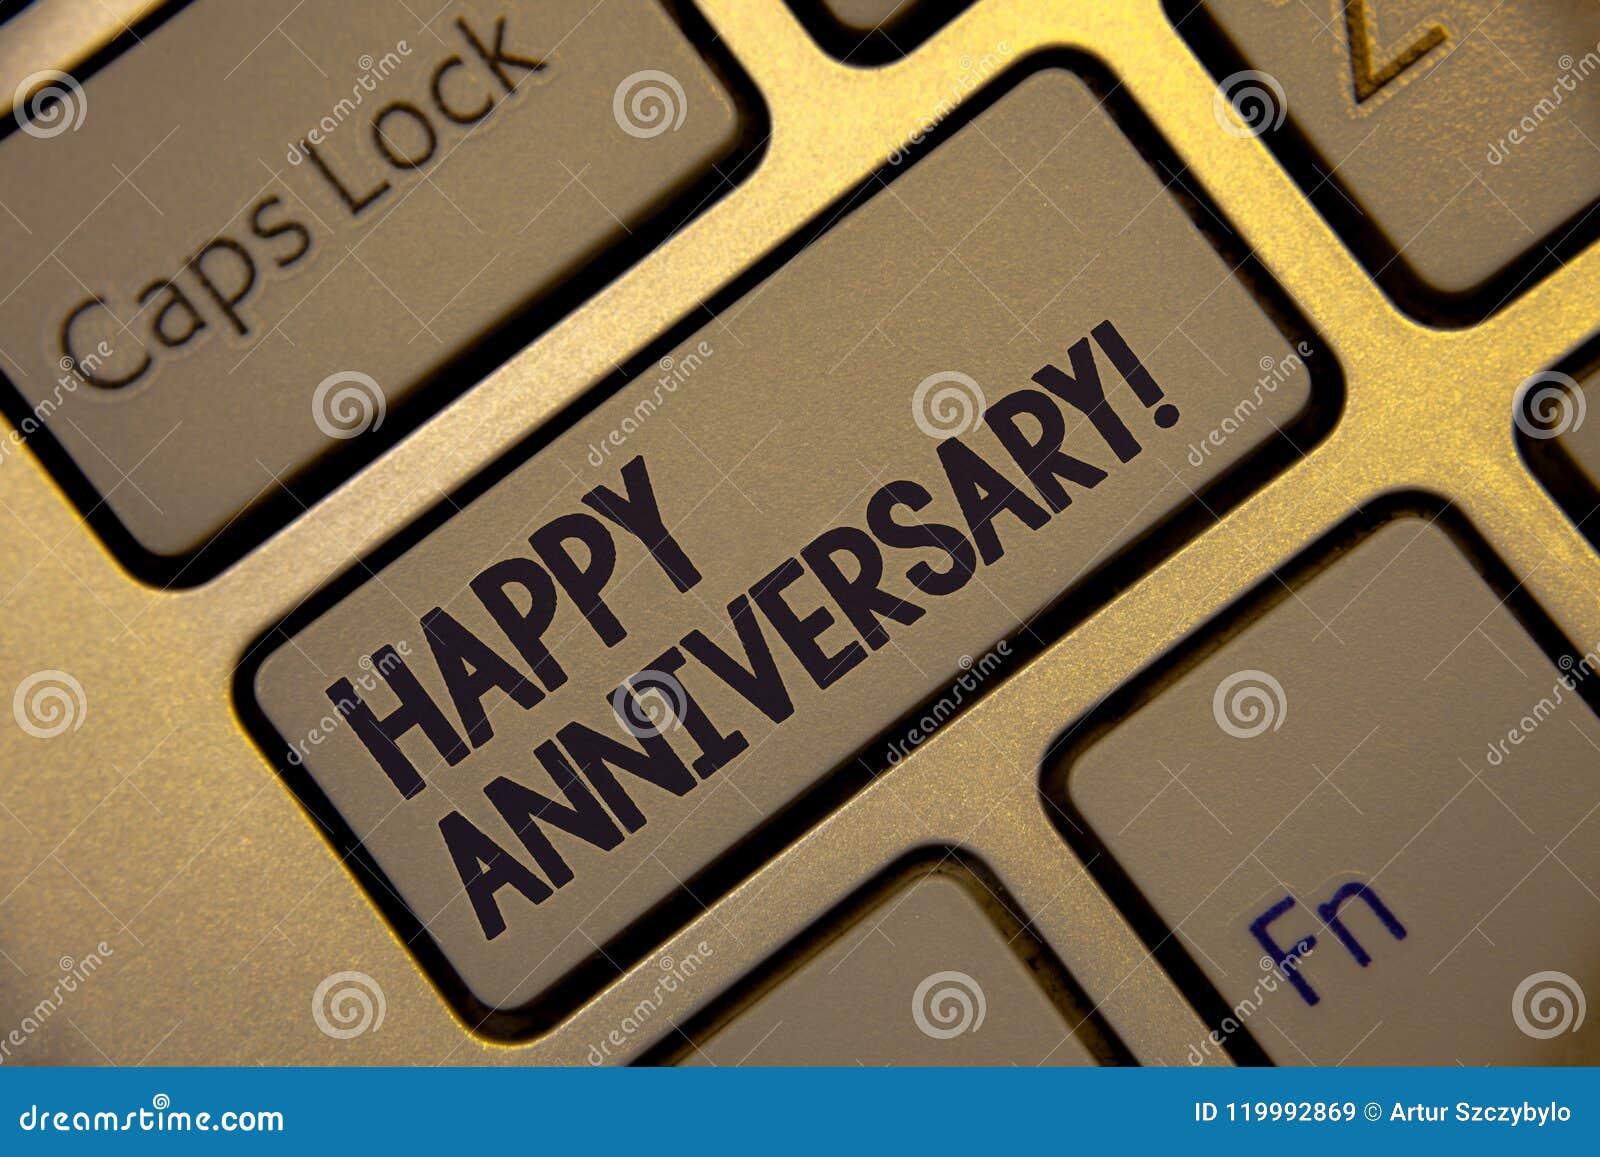 Anniversary milestone meanings